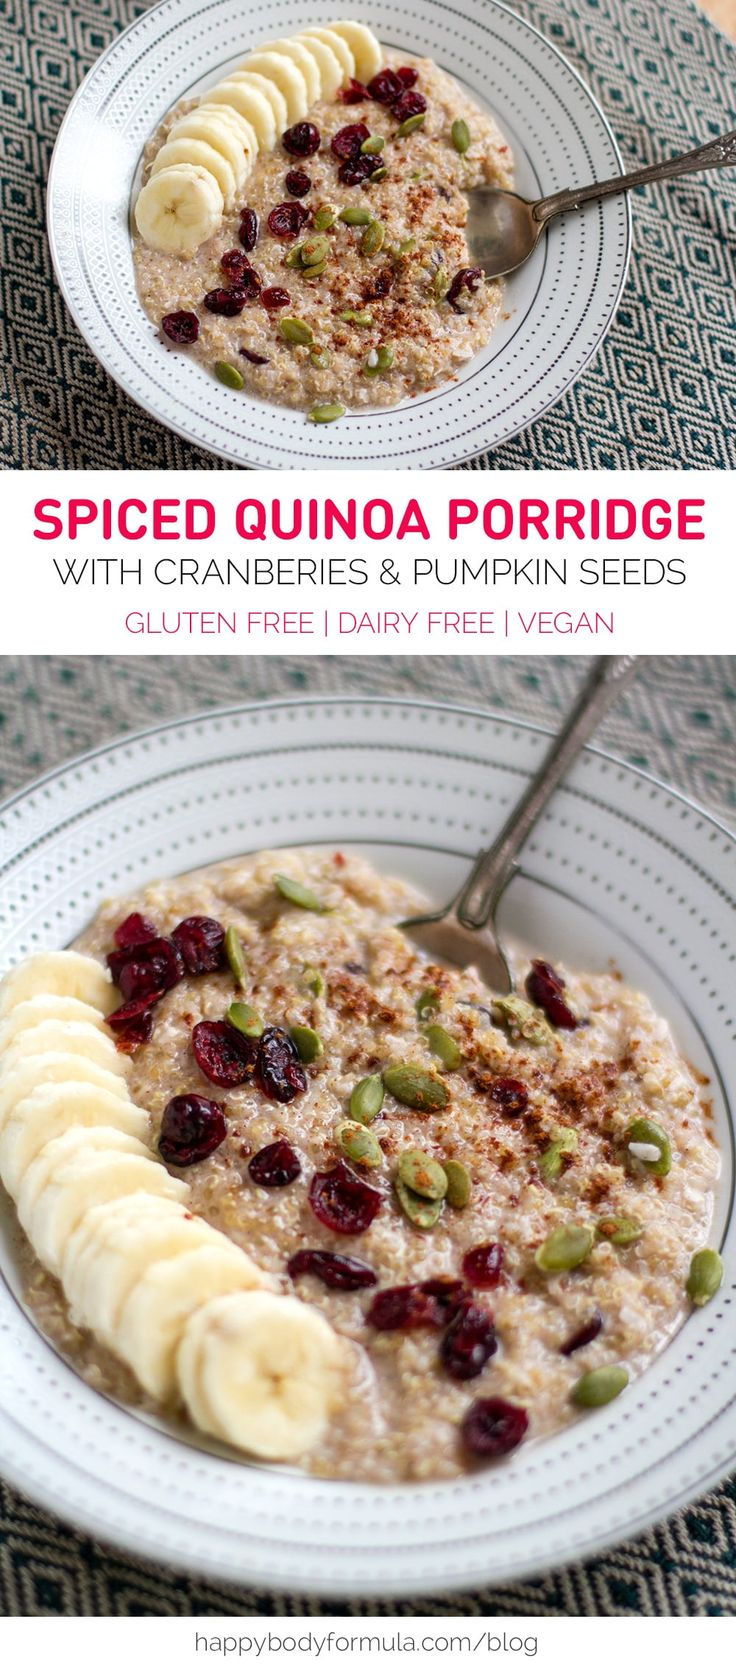 5-Minute Spiced Quinoa Coconut Porridge - Gluten Free, Dairy Free, Vegan. Via Happy Body Formula